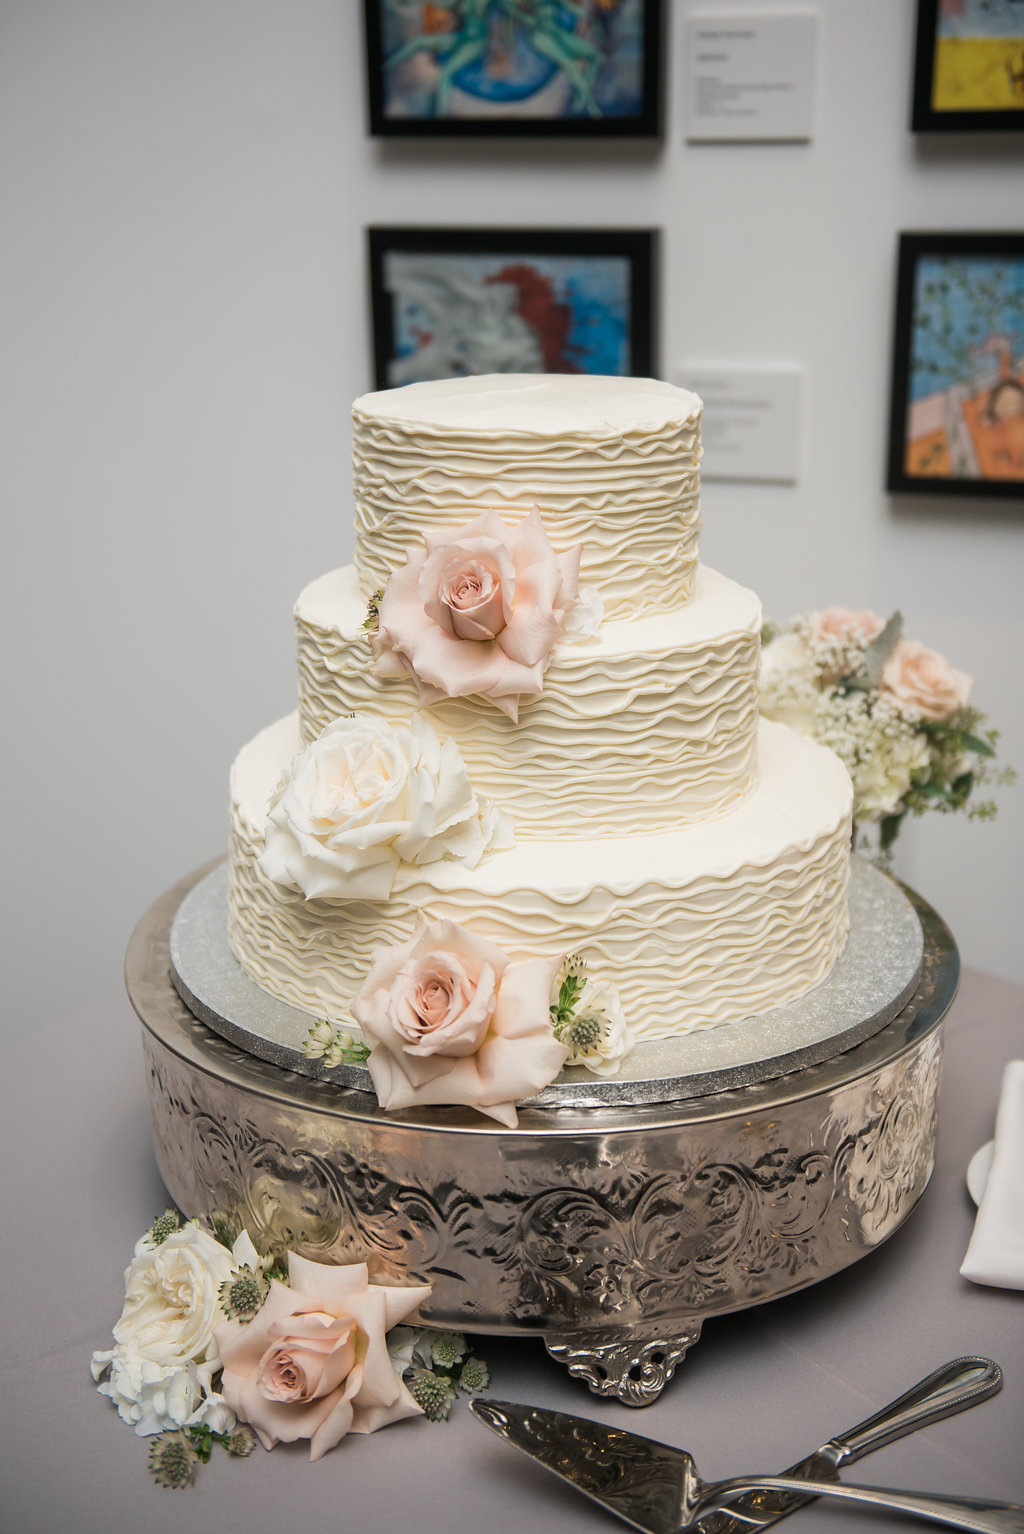 All White Wedding Cakes - Minimalist Wedding - Tampa Wedding Venue